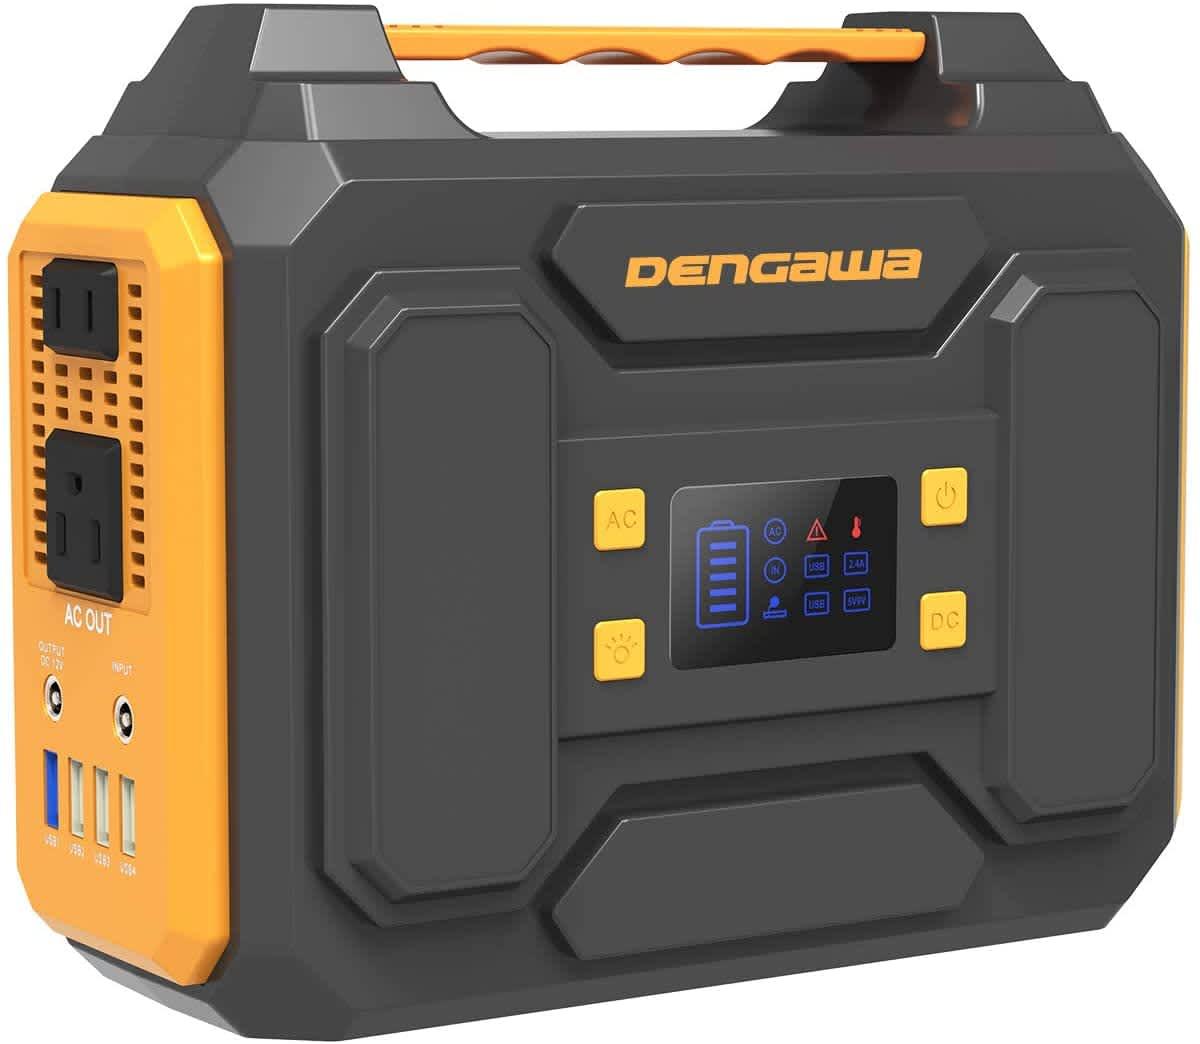 DenGaWa 250Wh Portable Power Station